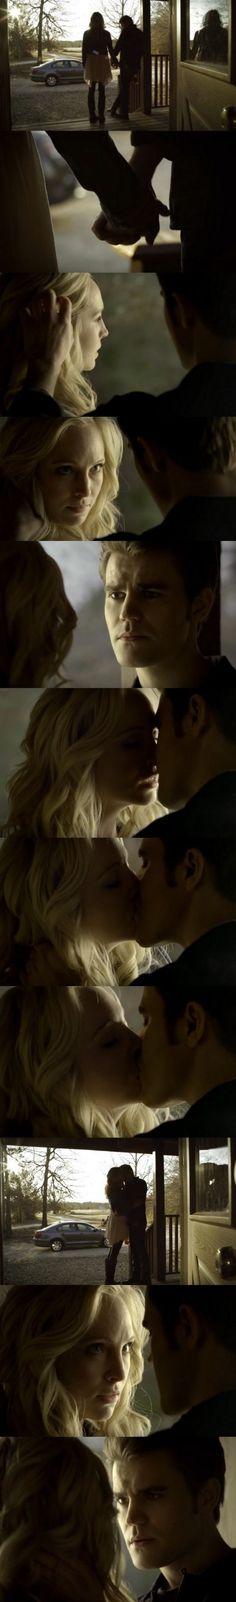 The Vampire Diaries TVD 6x14 - Steroline first kiss ♥♥♥